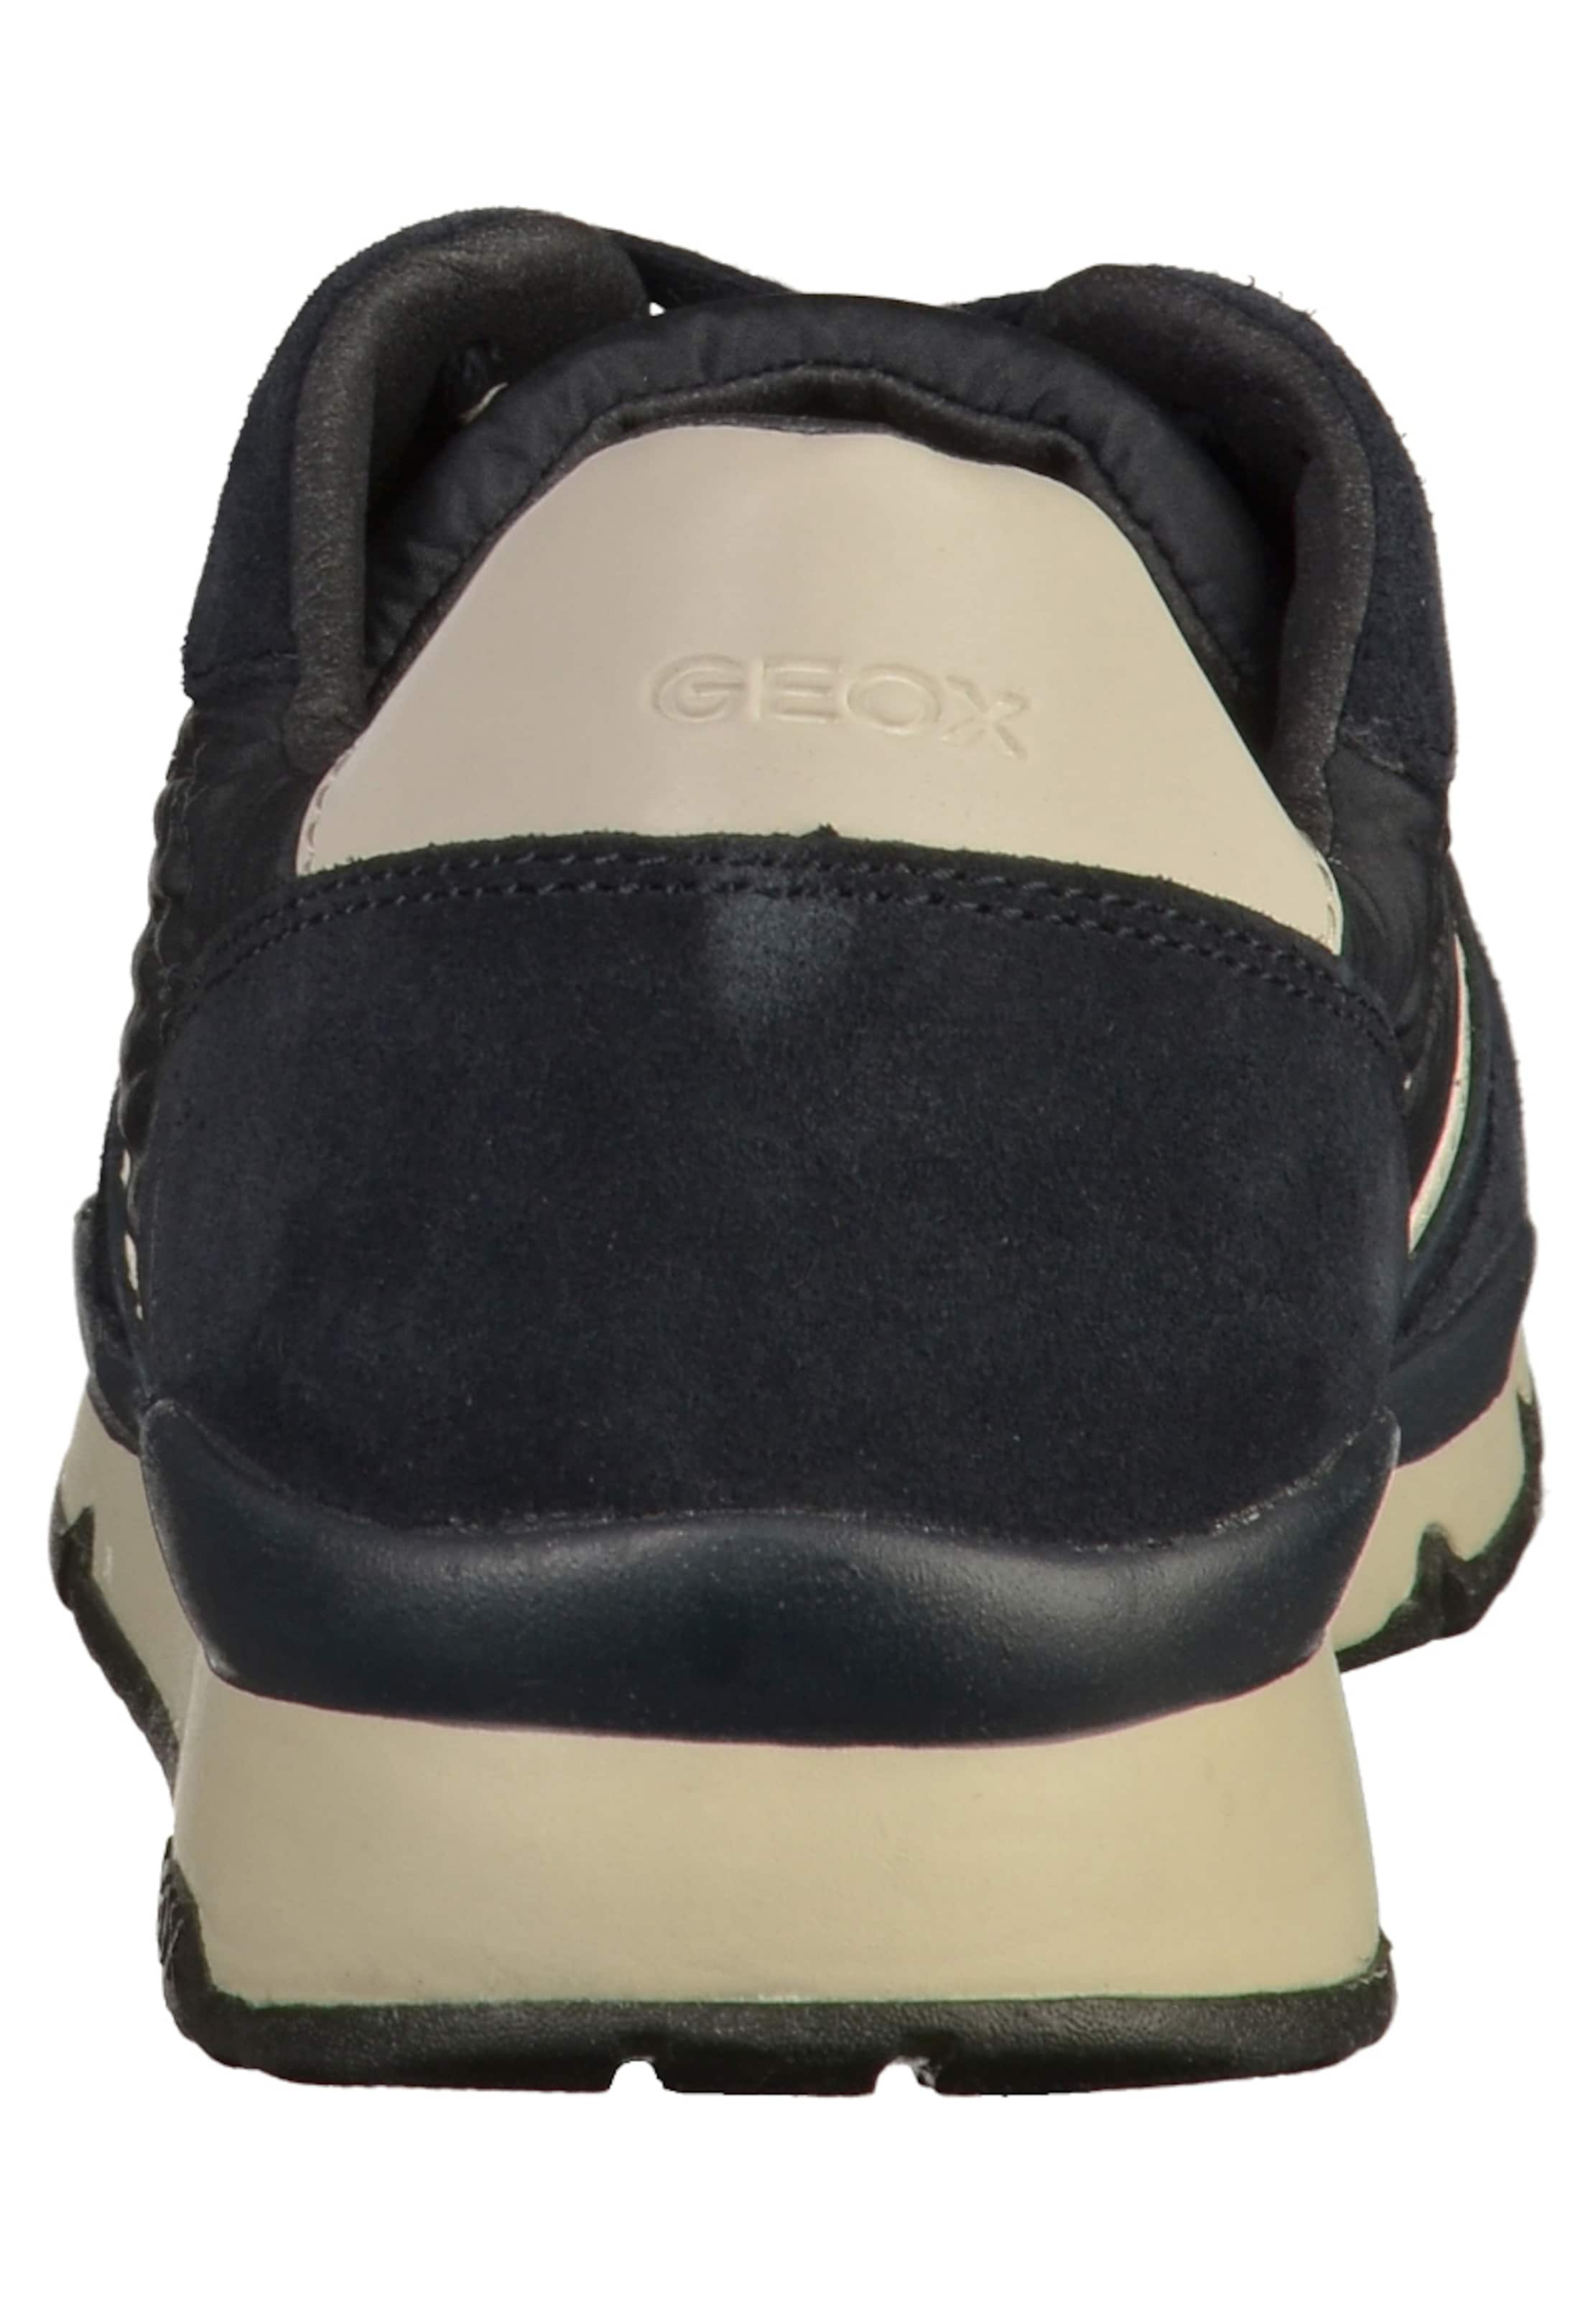 GEOX Turnschuhe Leder, Leder, Leder, sonstiges Material Verkaufen Sie saisonale Aktionen 473217